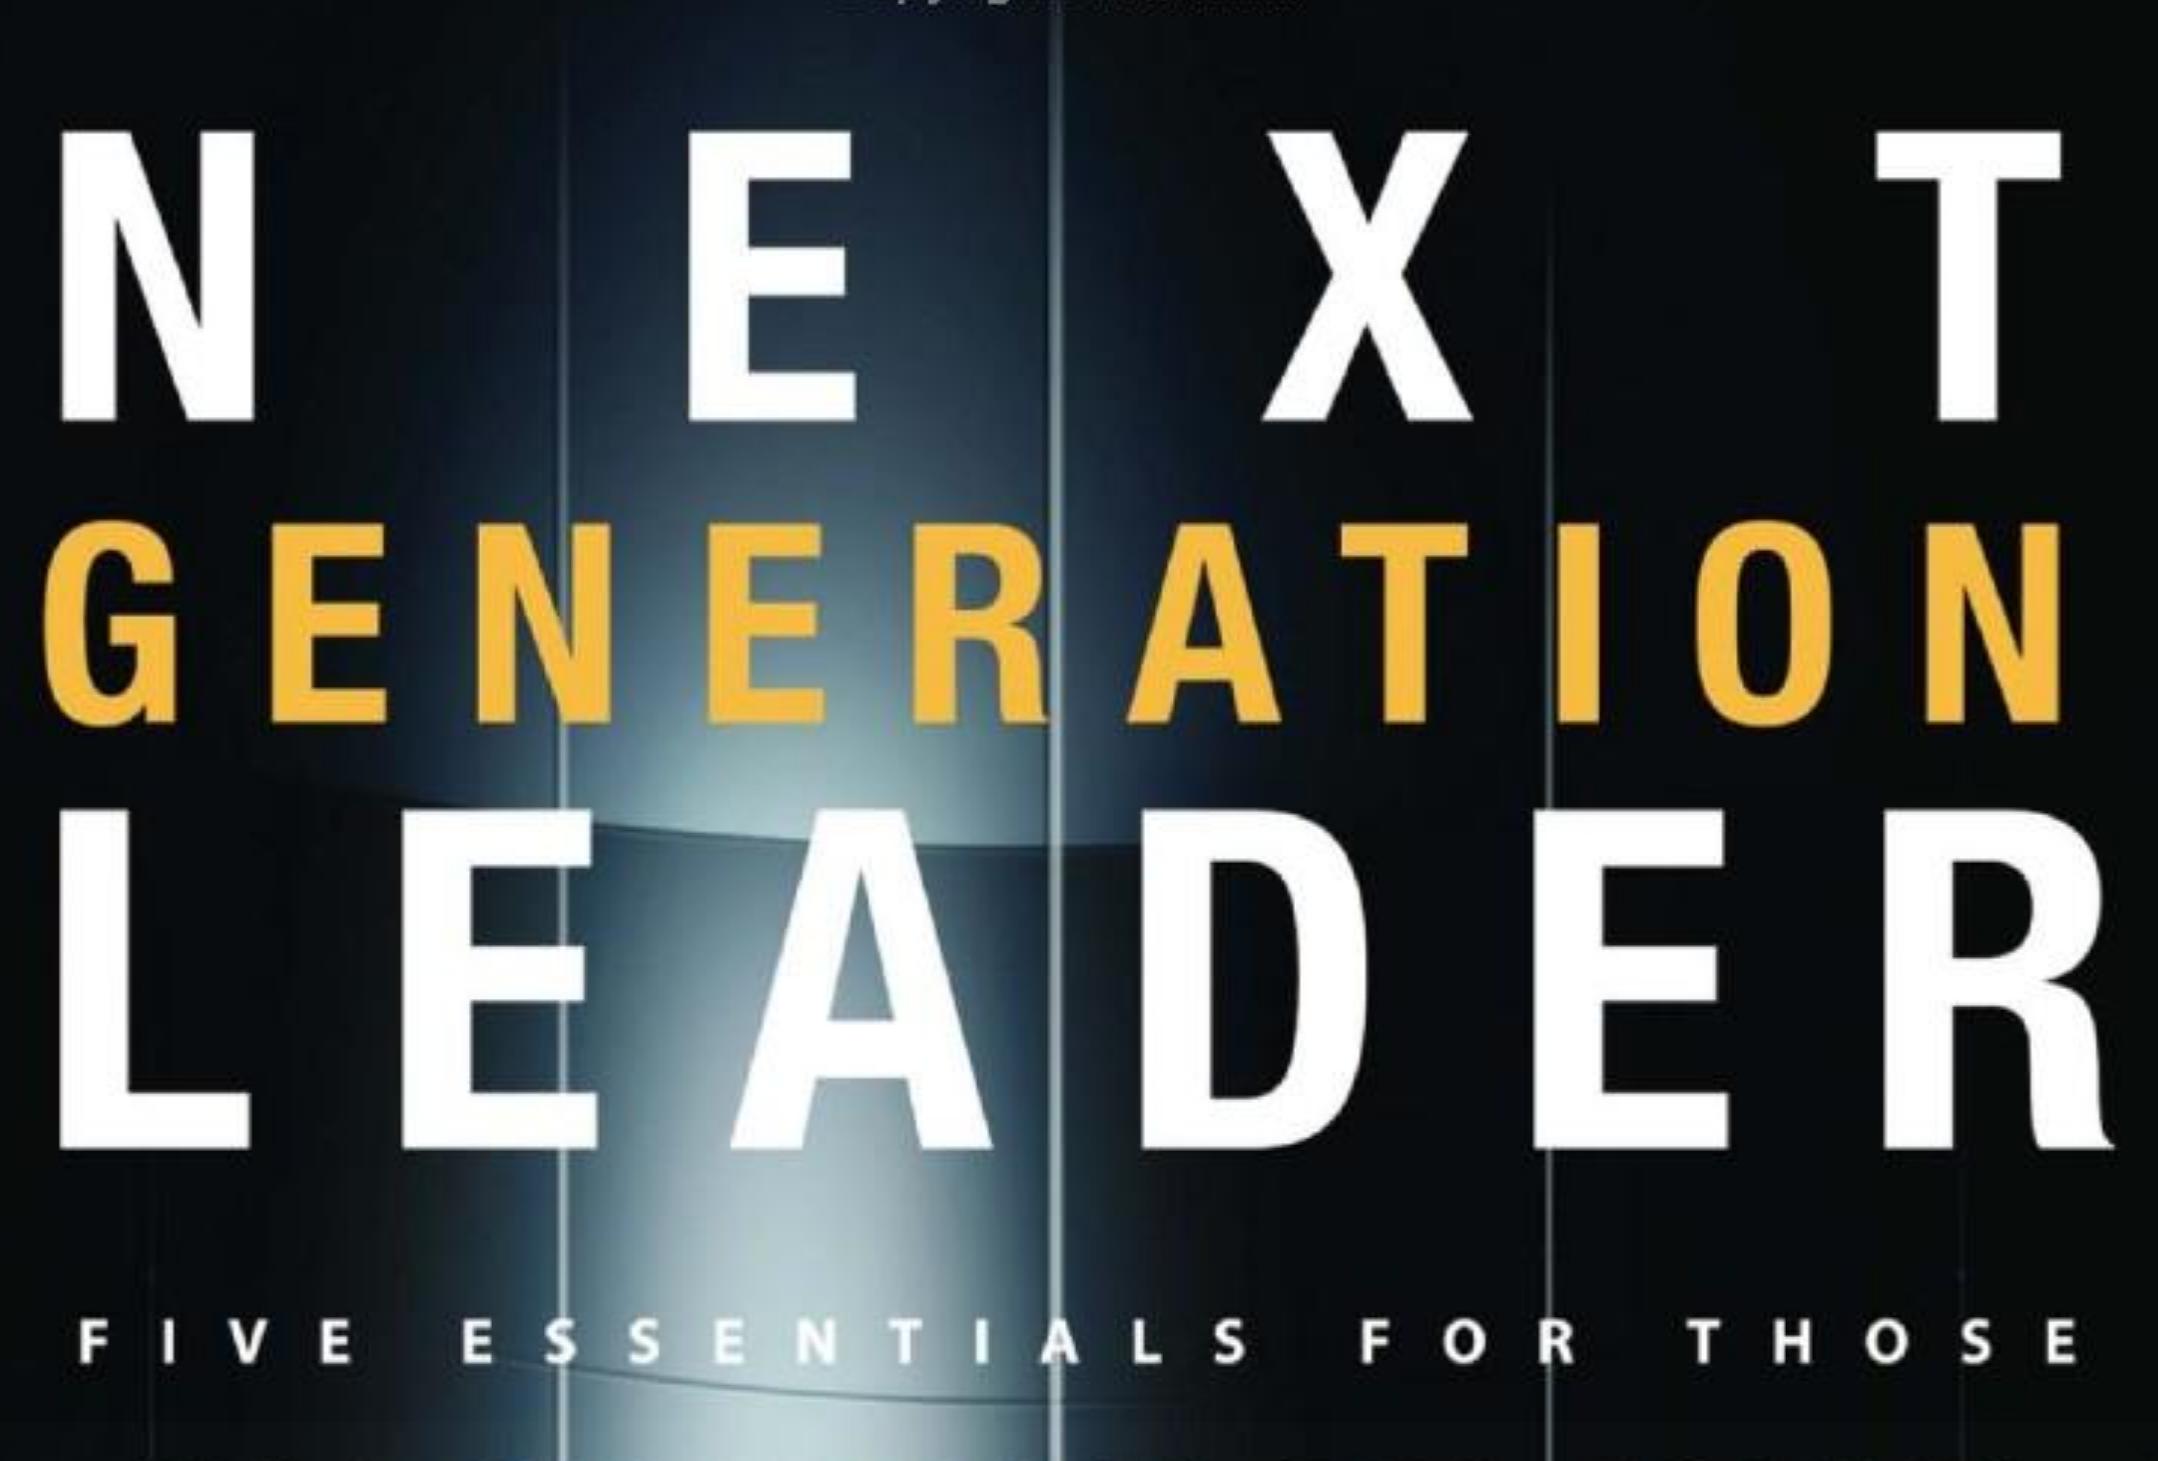 Next-Generation-Leader-FI.png